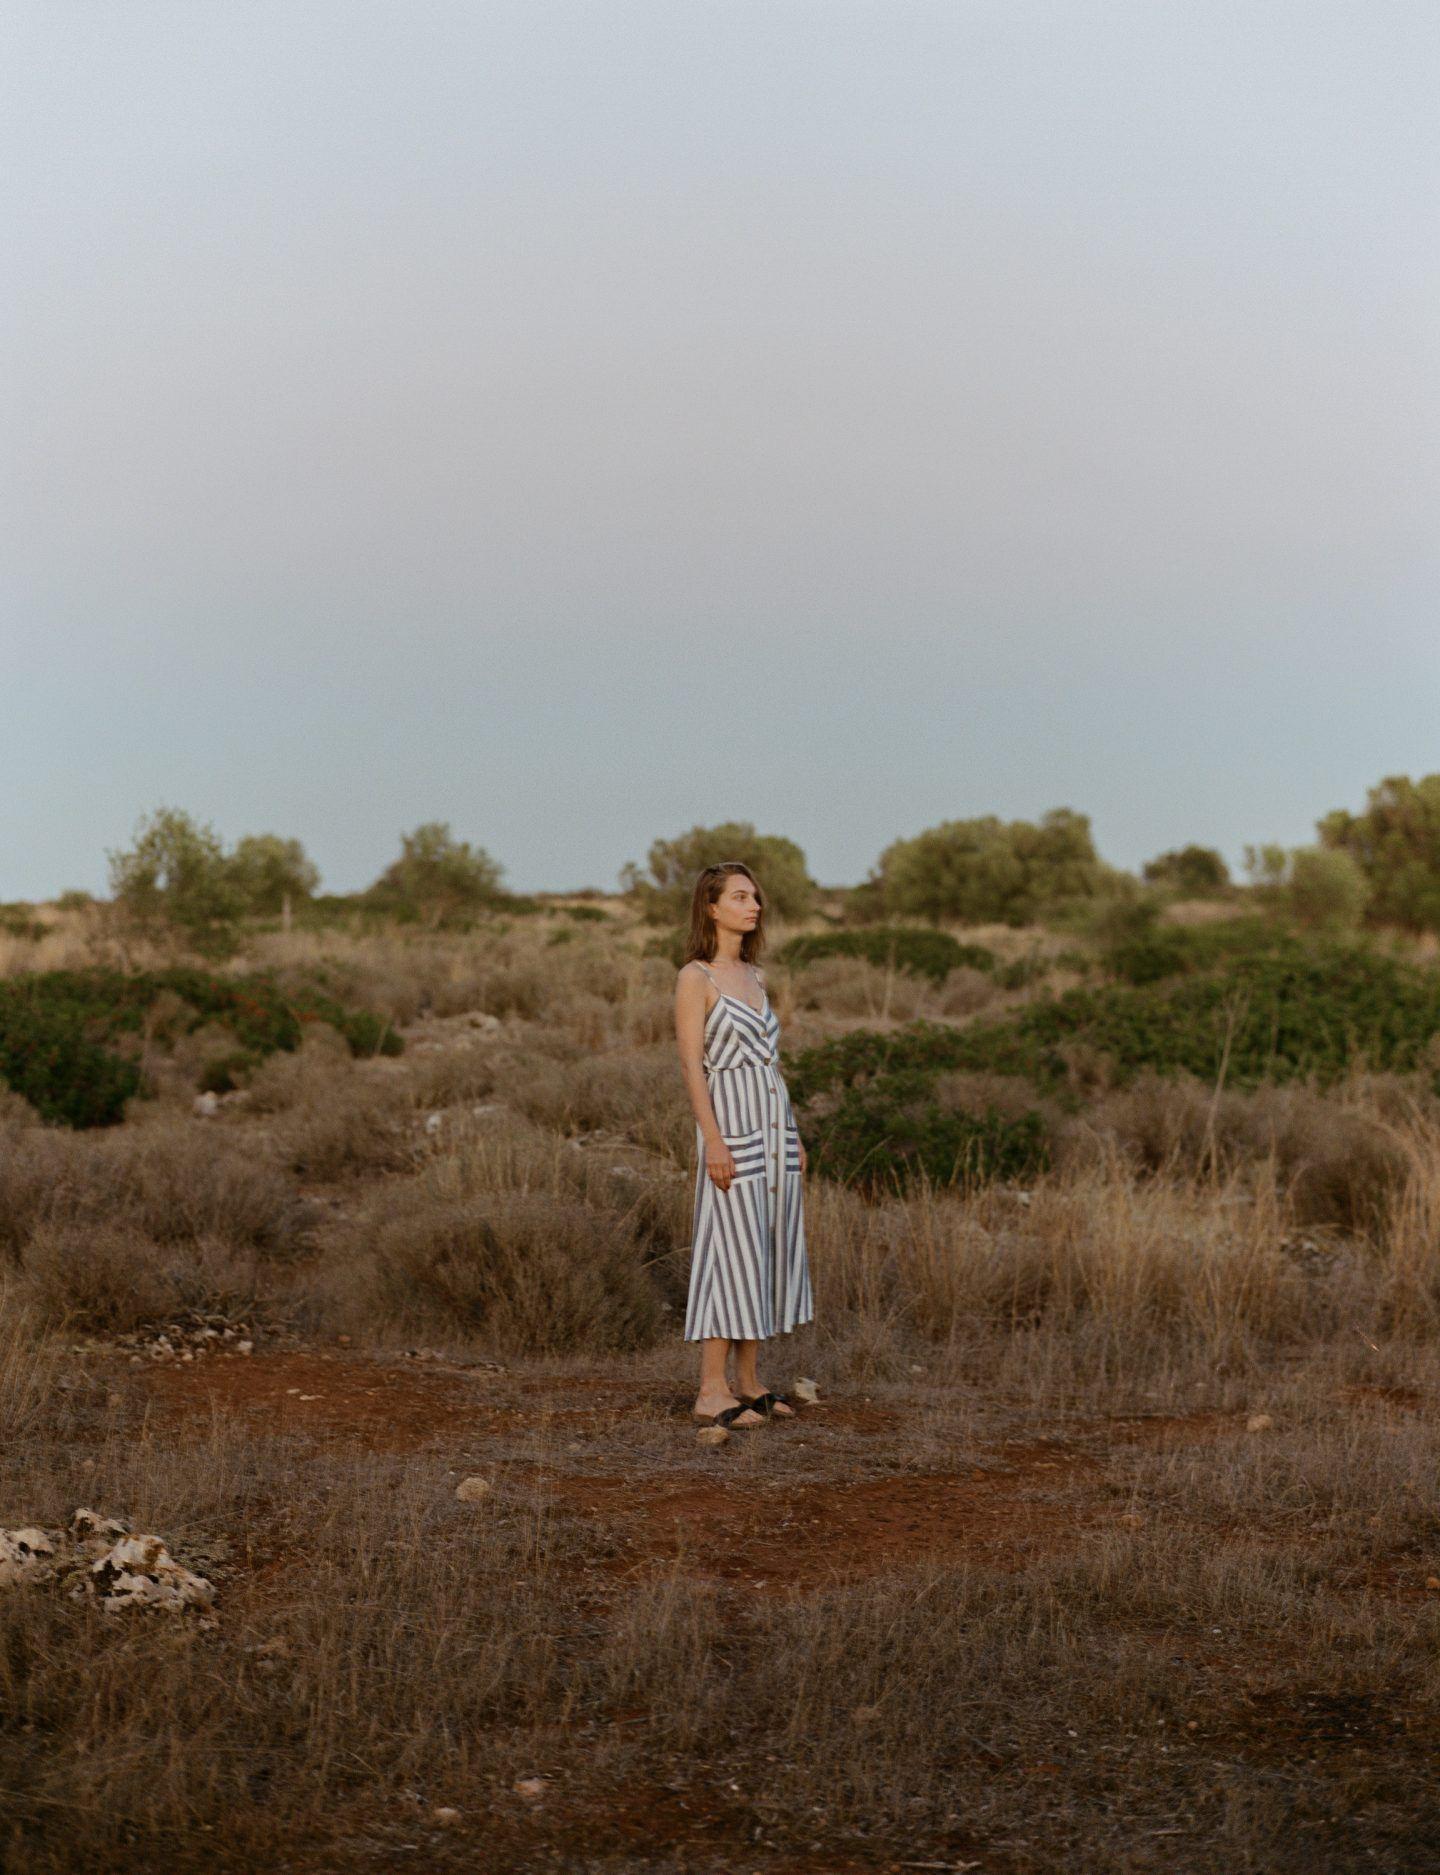 IGNANT-Photography-Daniel-Faro-Sicily-02